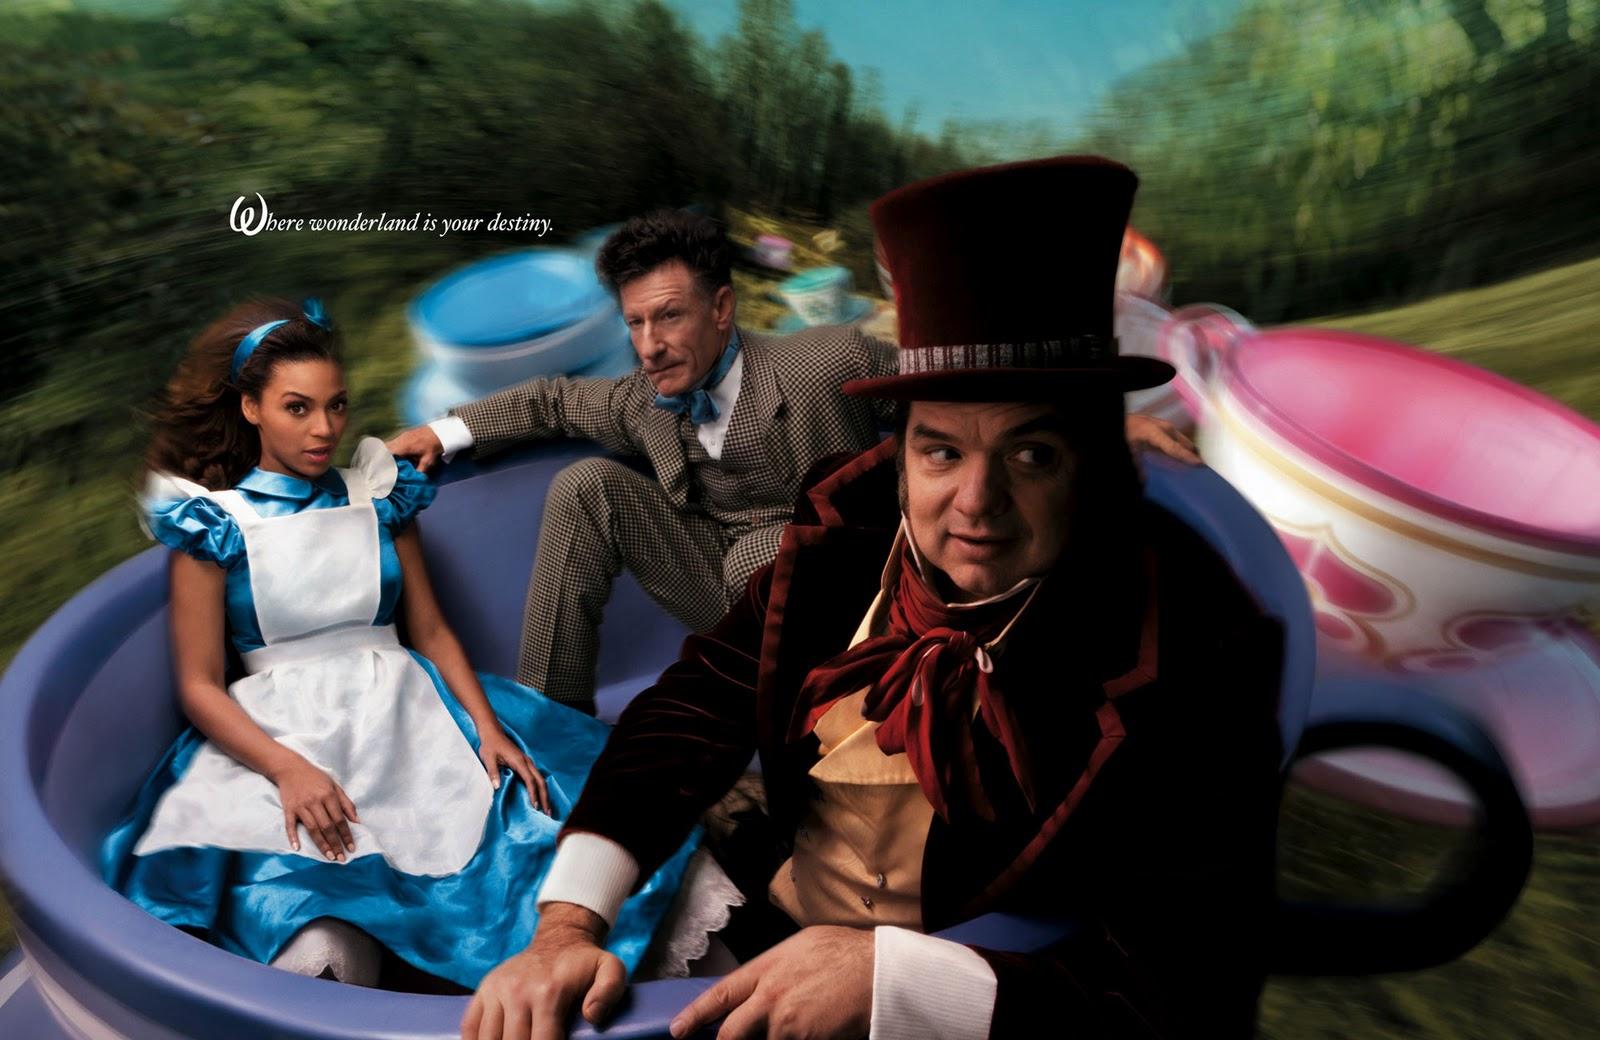 http://4.bp.blogspot.com/_vvDWoG_XX-0/TQn1n5m4v4I/AAAAAAAABF0/j9zk_DZvOlQ/s1600/Alice-In-Wonderland-annie-leibovitz-144319_1920_1248.jpg